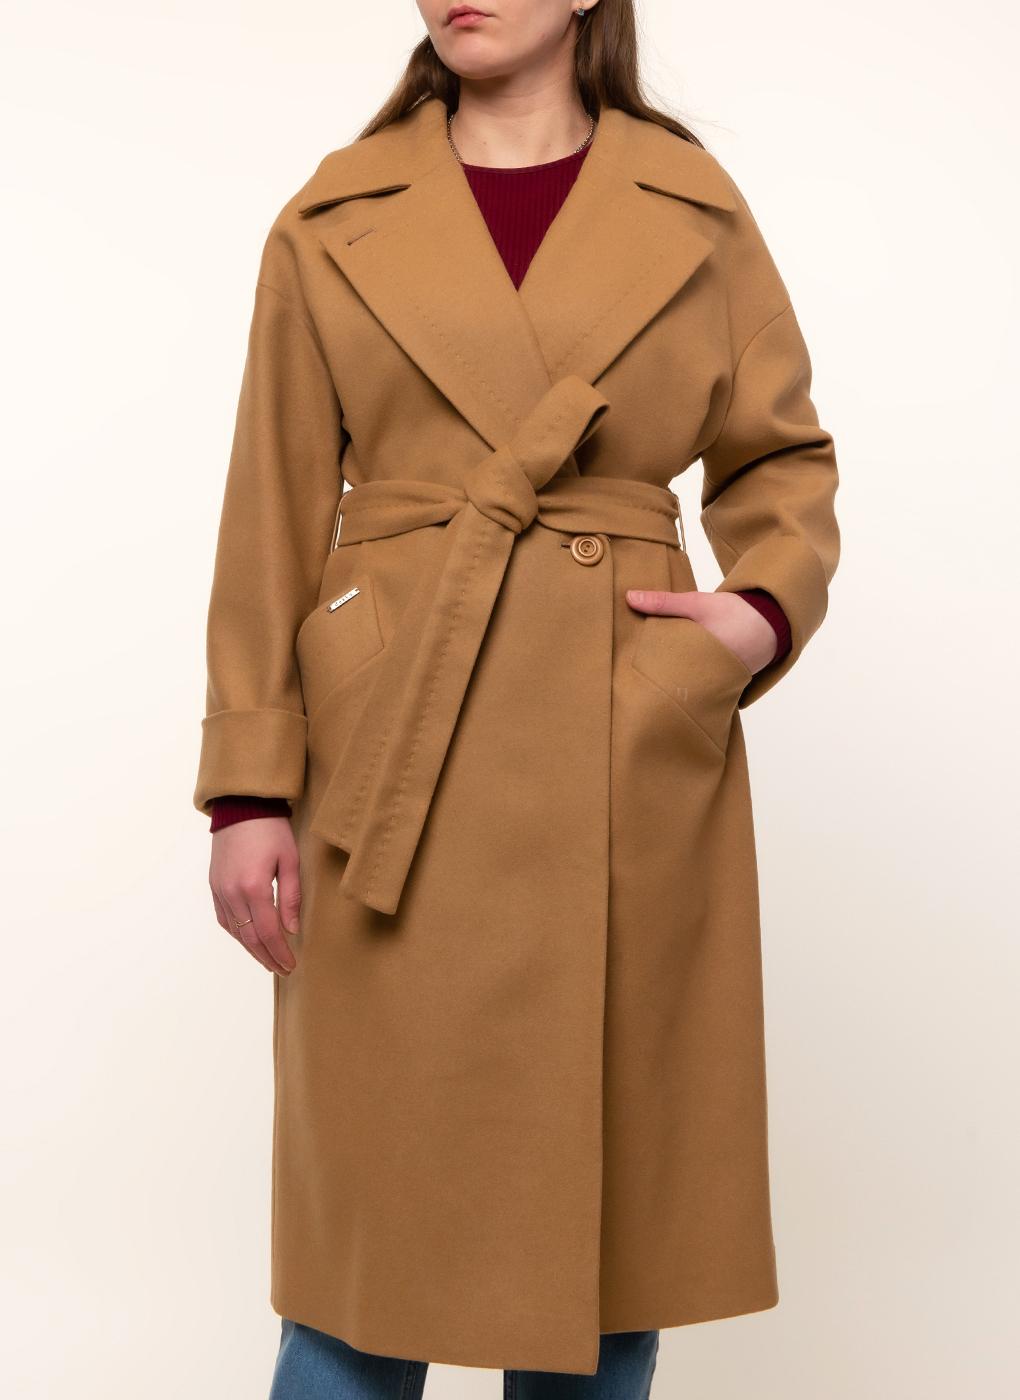 Пальто прямое шерстяное 70, idekka фото